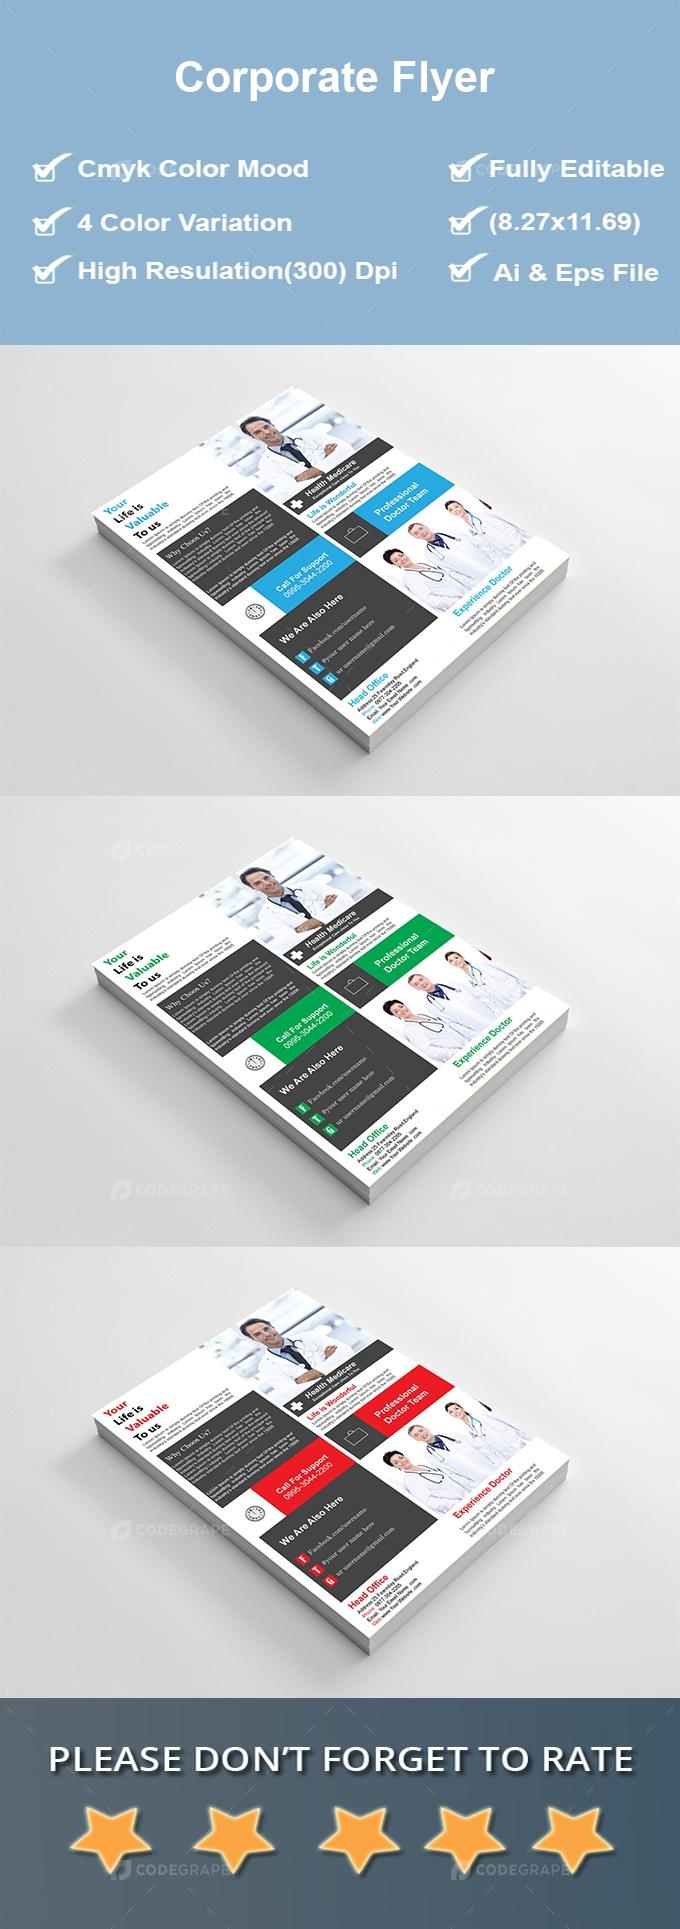 Doctor's Flyer Design